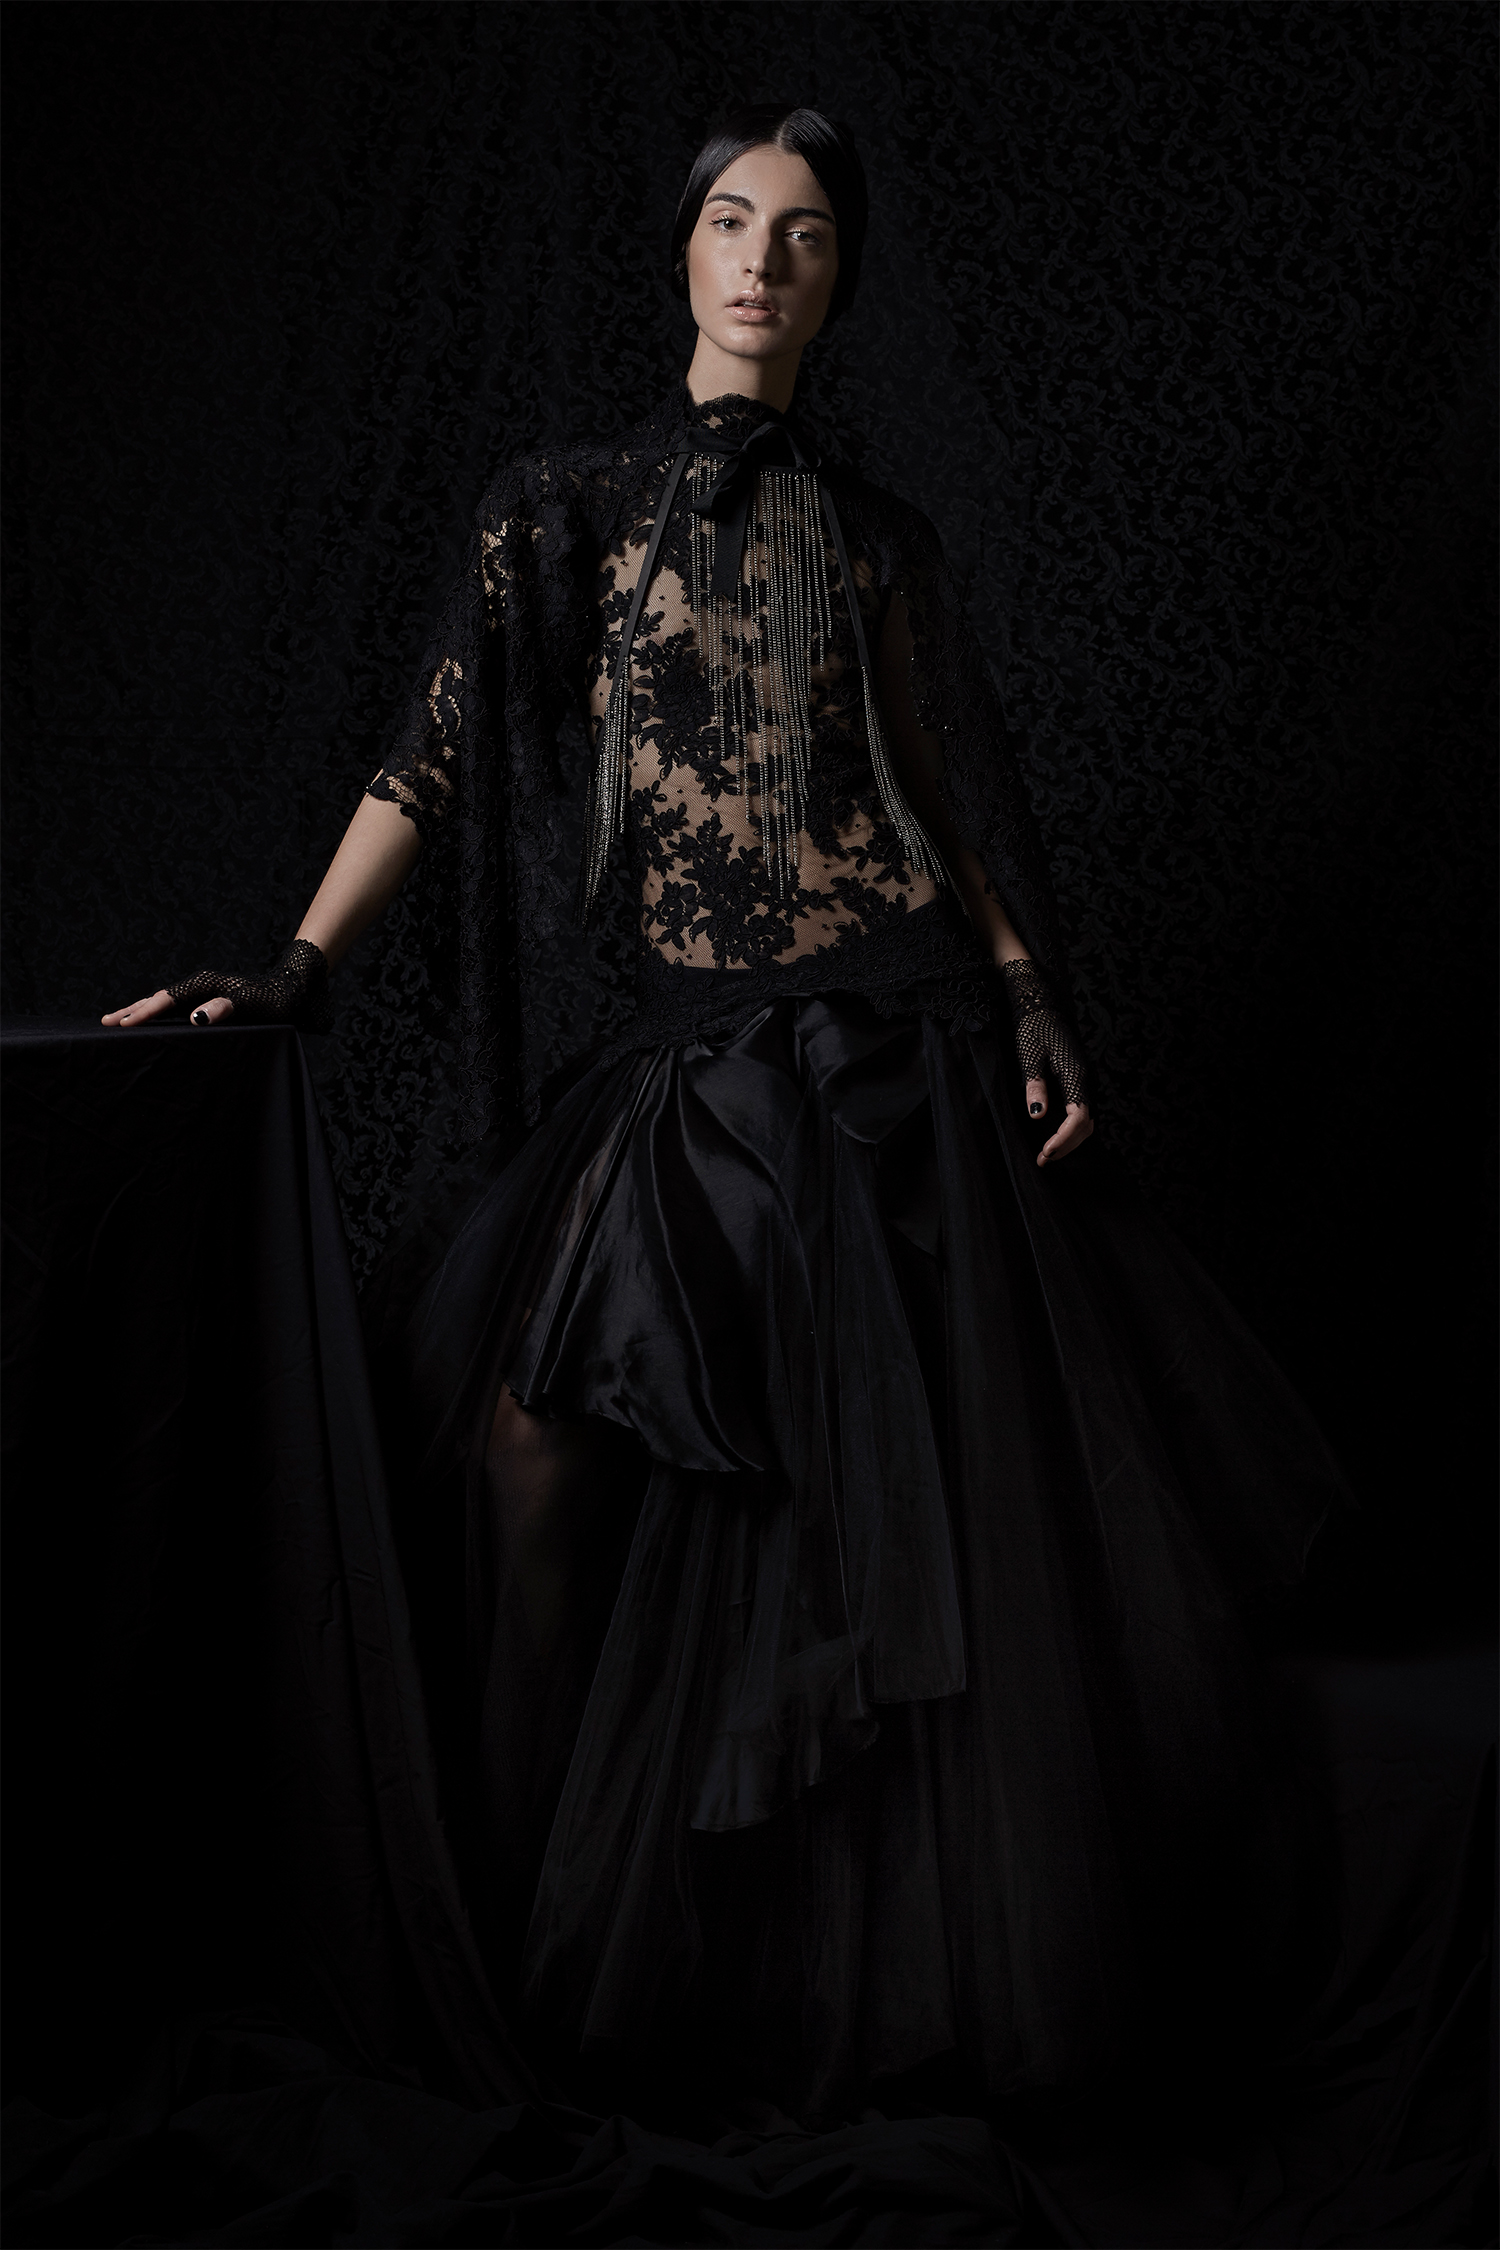 Black dress with lace bodice,Giada Curti; black leather necklace with metal fringe, Zora Romanska